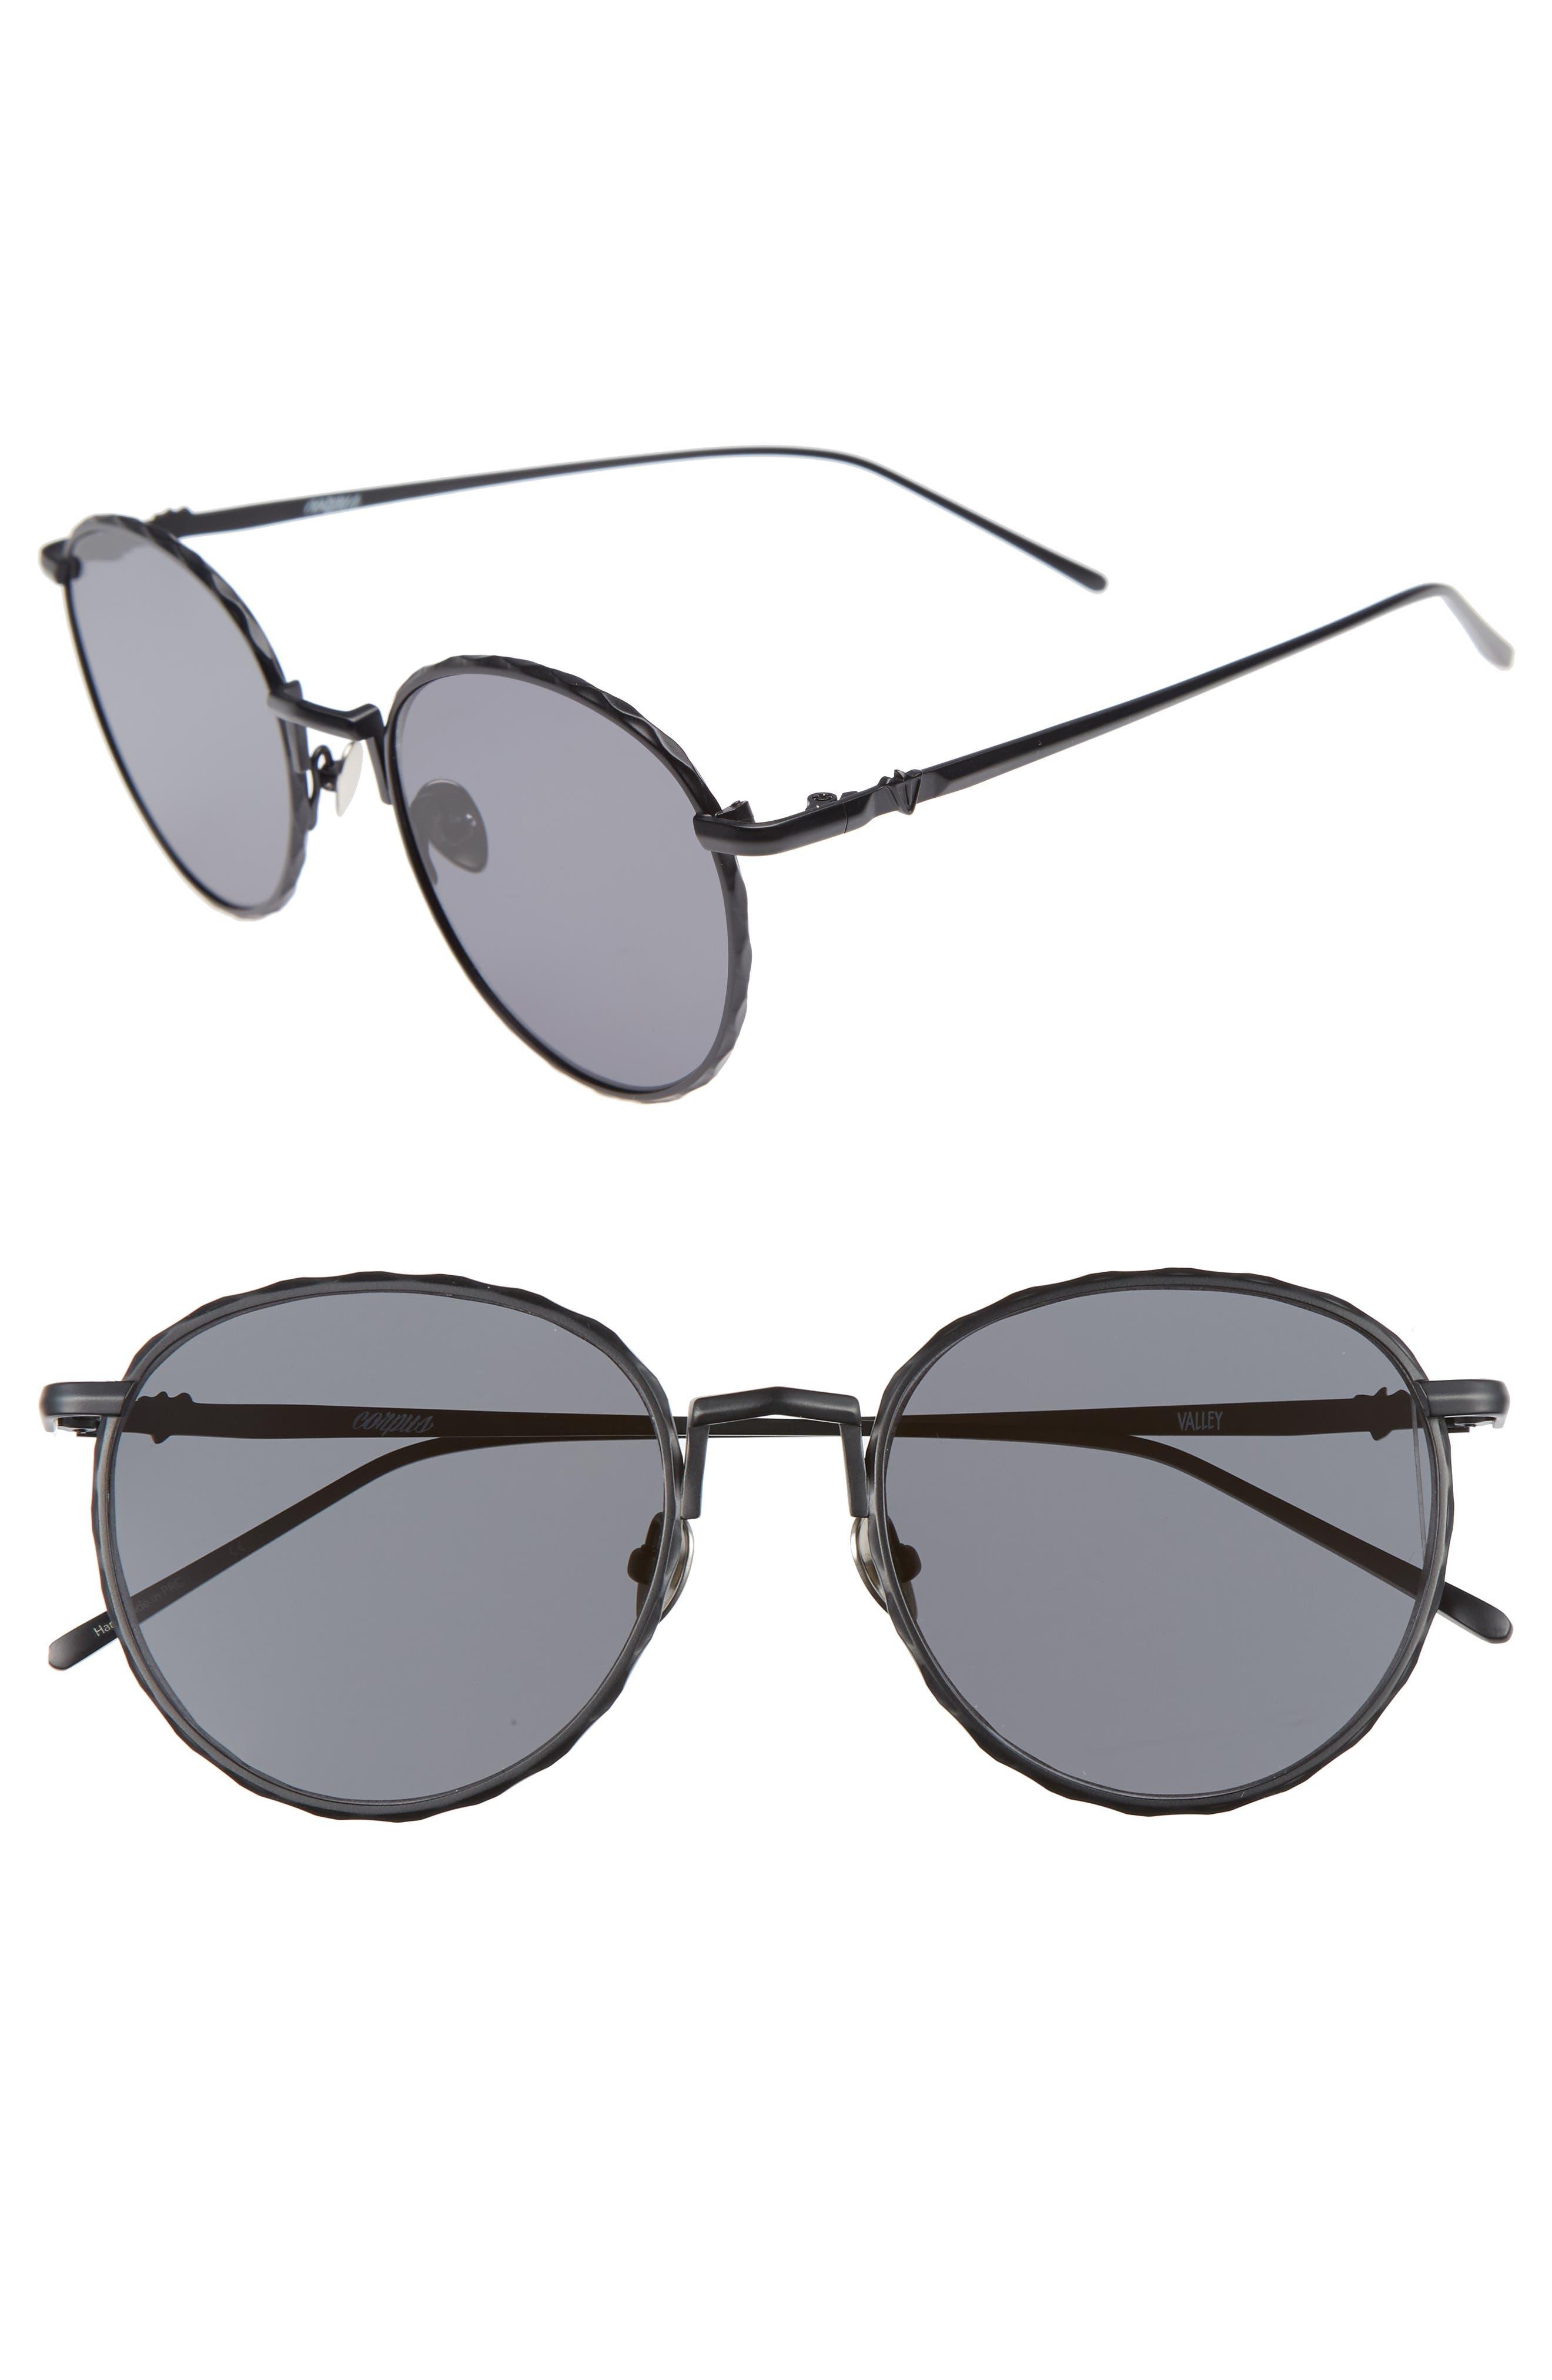 Corpus 53mm Round Sunglasses,                             Main thumbnail 1, color,                             001